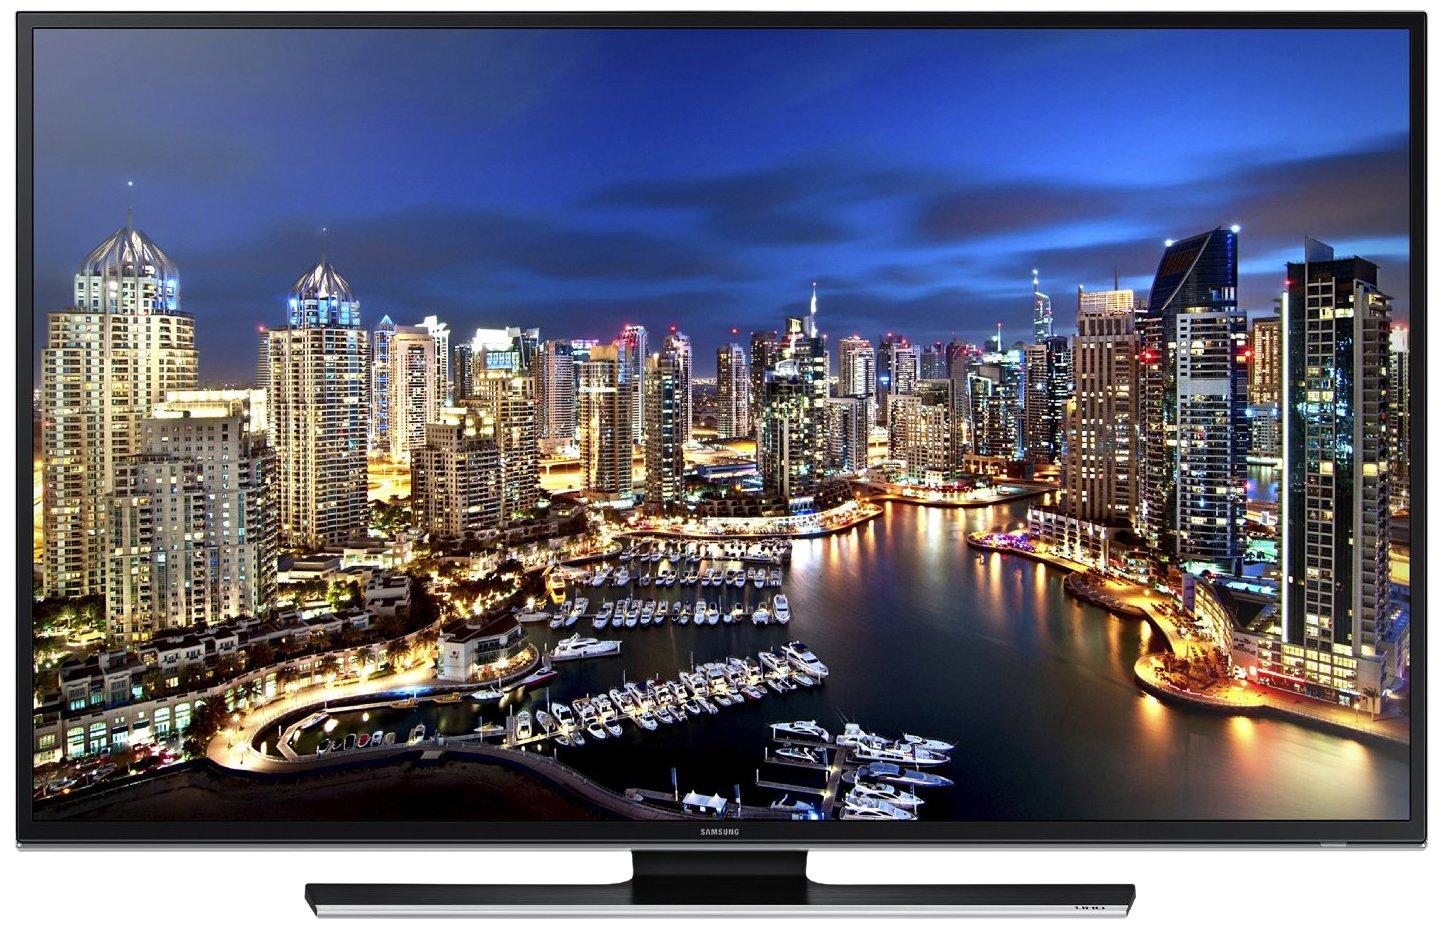 Samsung-UN40HU6950-40-Inch-4K-Ultra-HD-60Hz-Smart-LED-TV